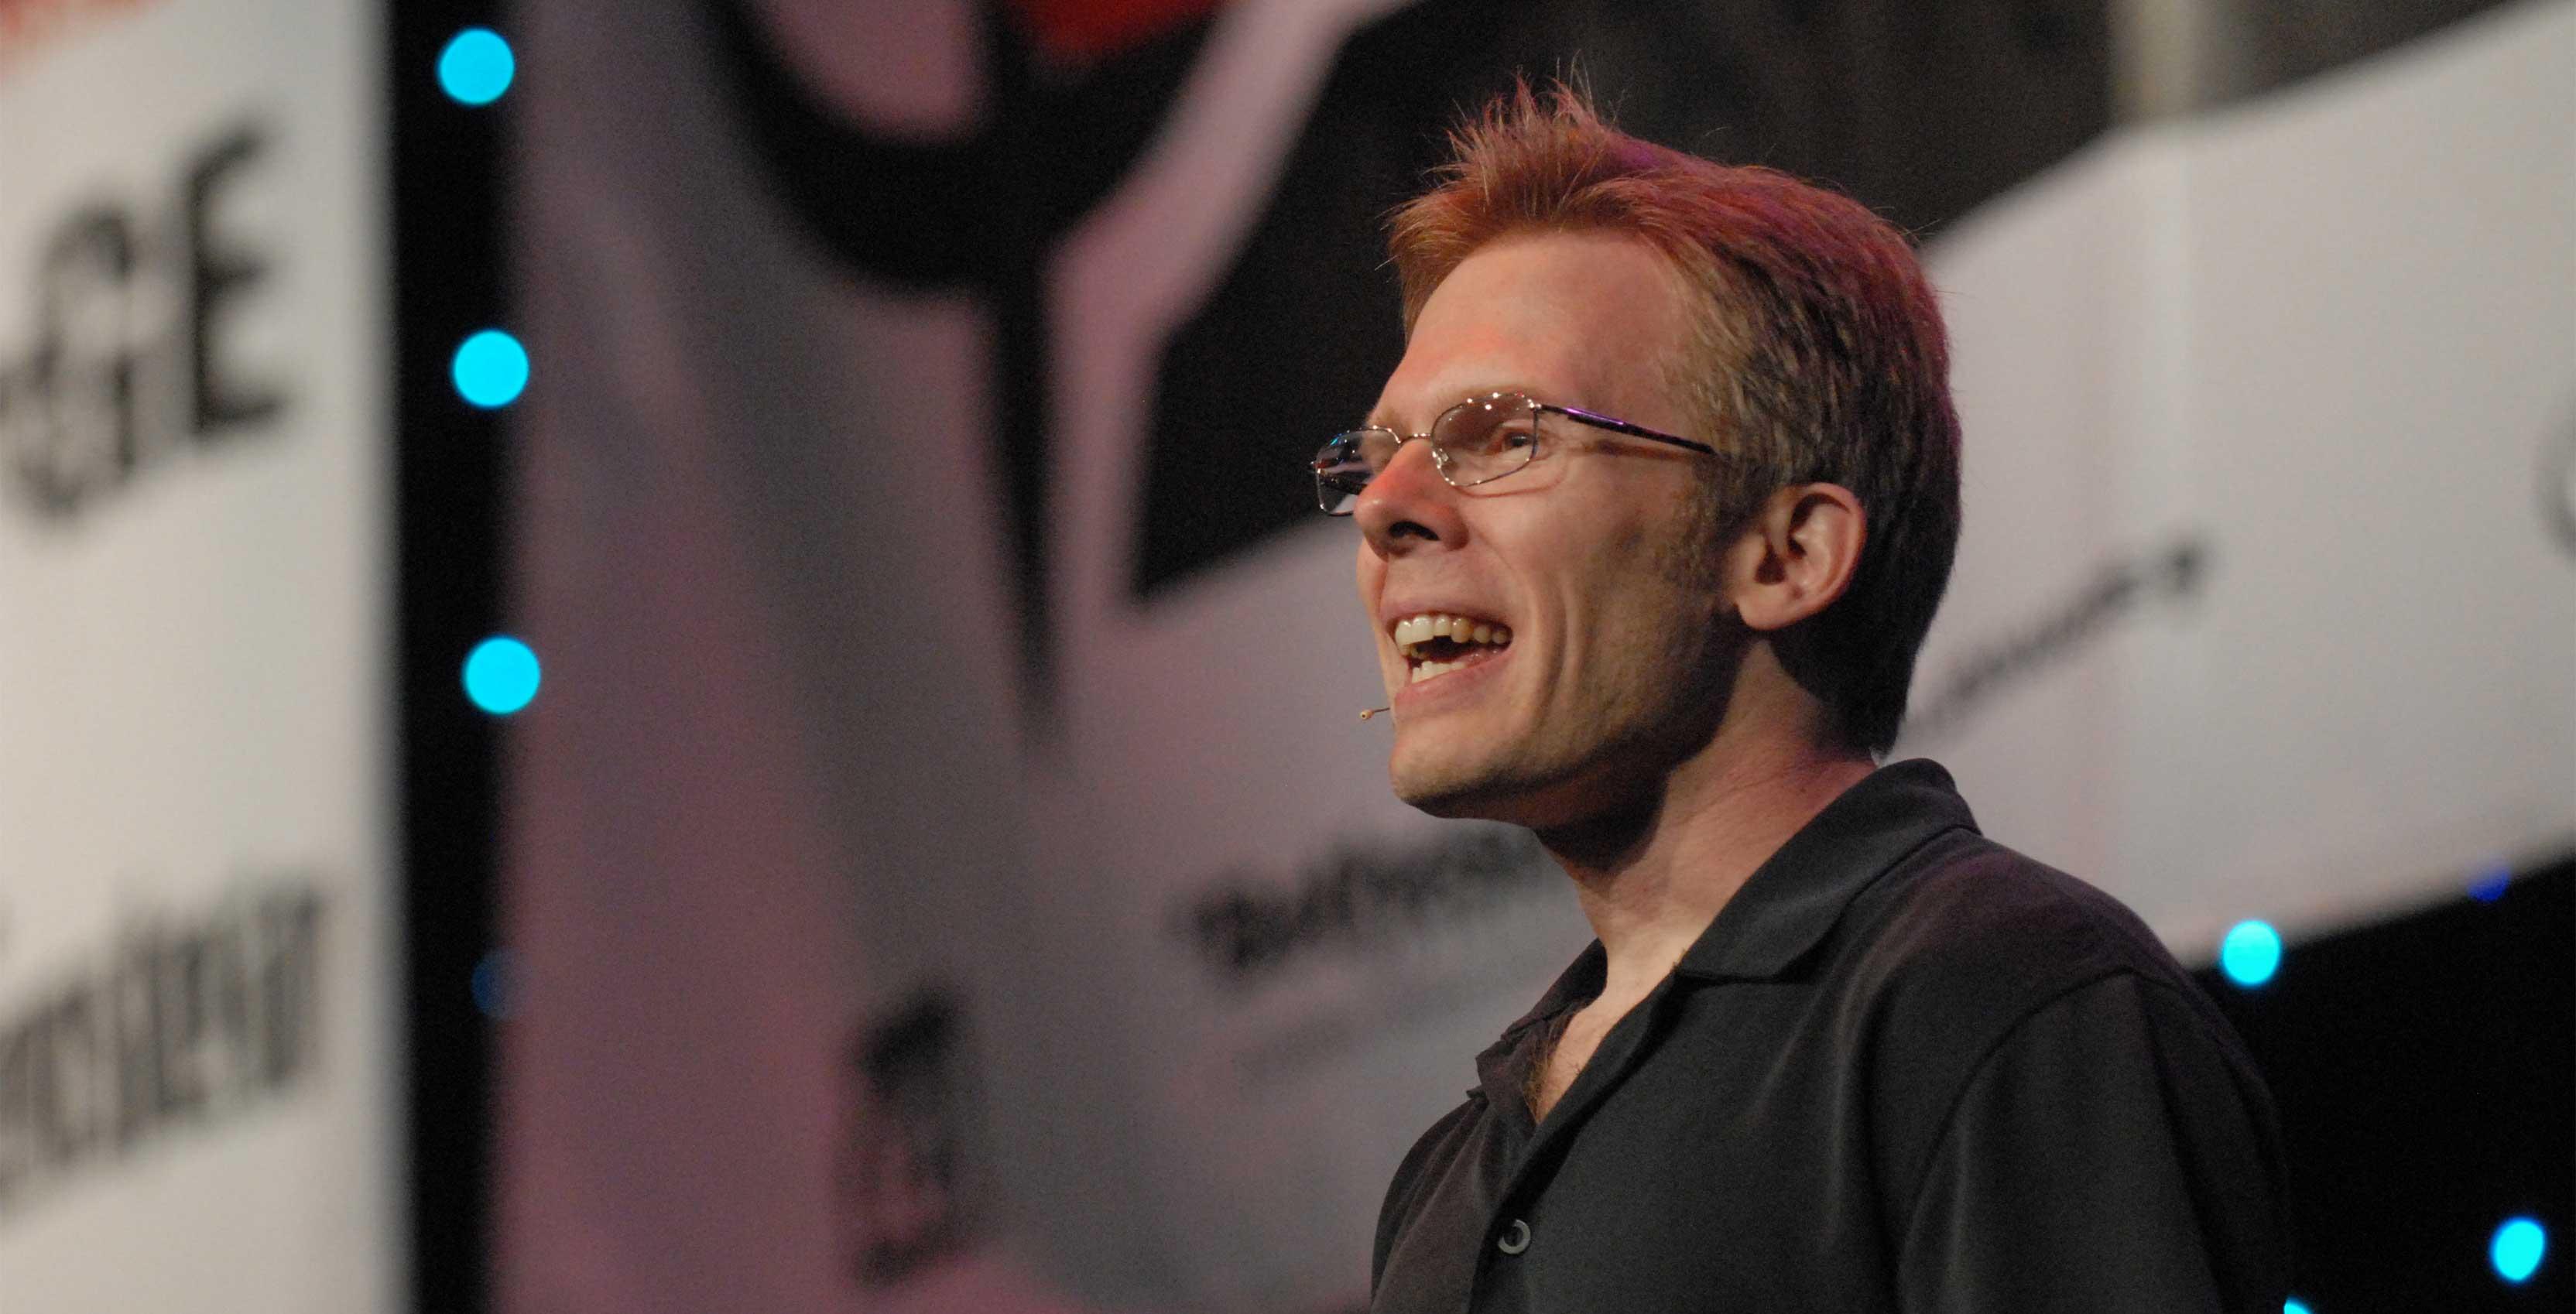 John Carmack at QuakeCon - Oculus Rift sues Zenimax